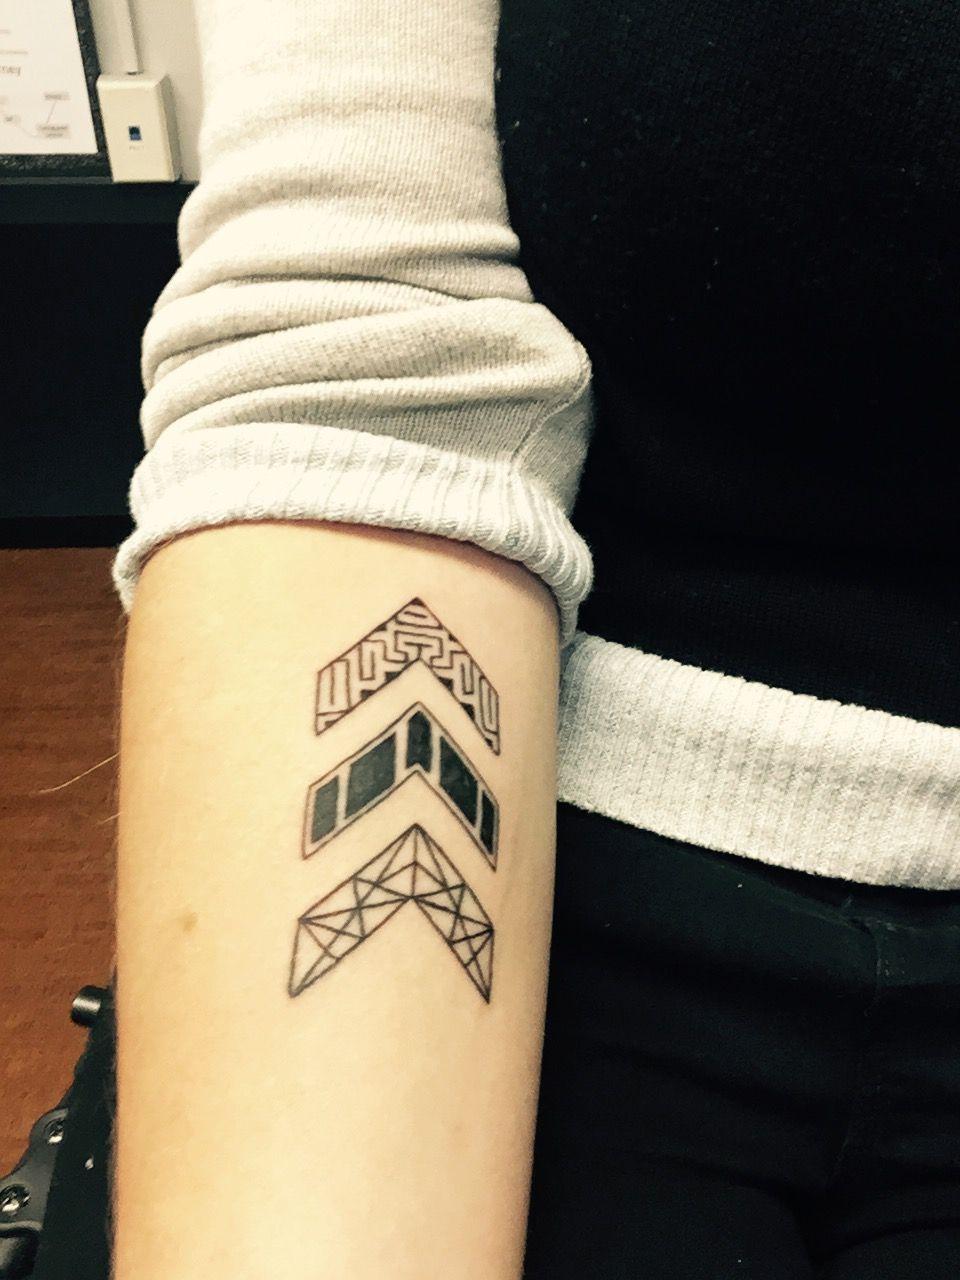 Geometric Design Chevron Tattoo On Forearm By Kellsey Mull